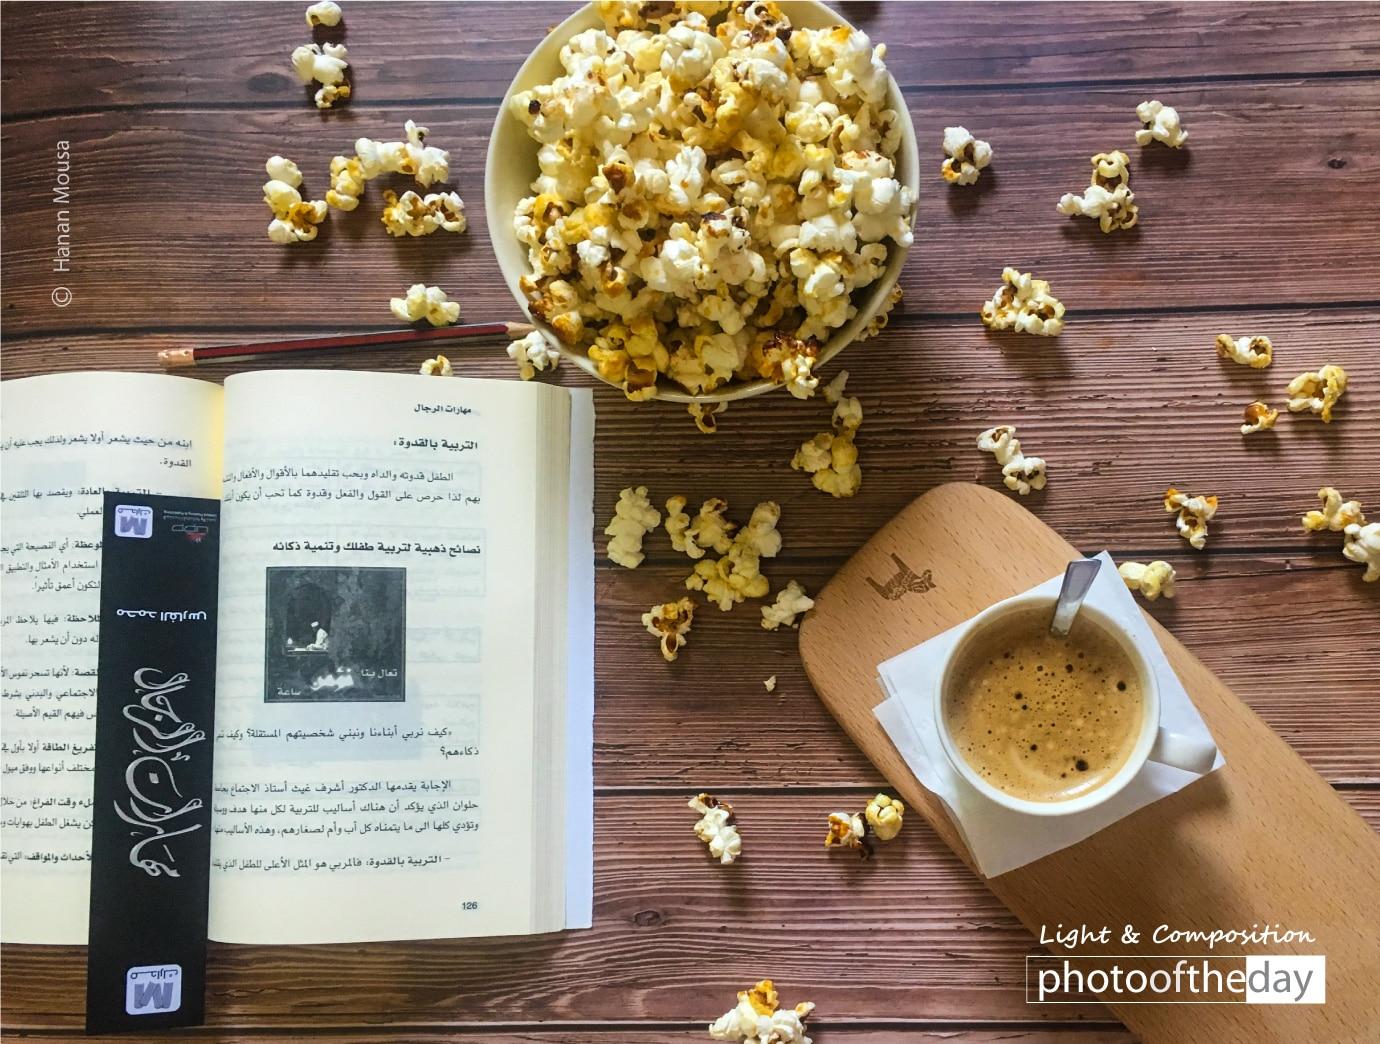 Popcorn and coffee by Hanan AboRegela